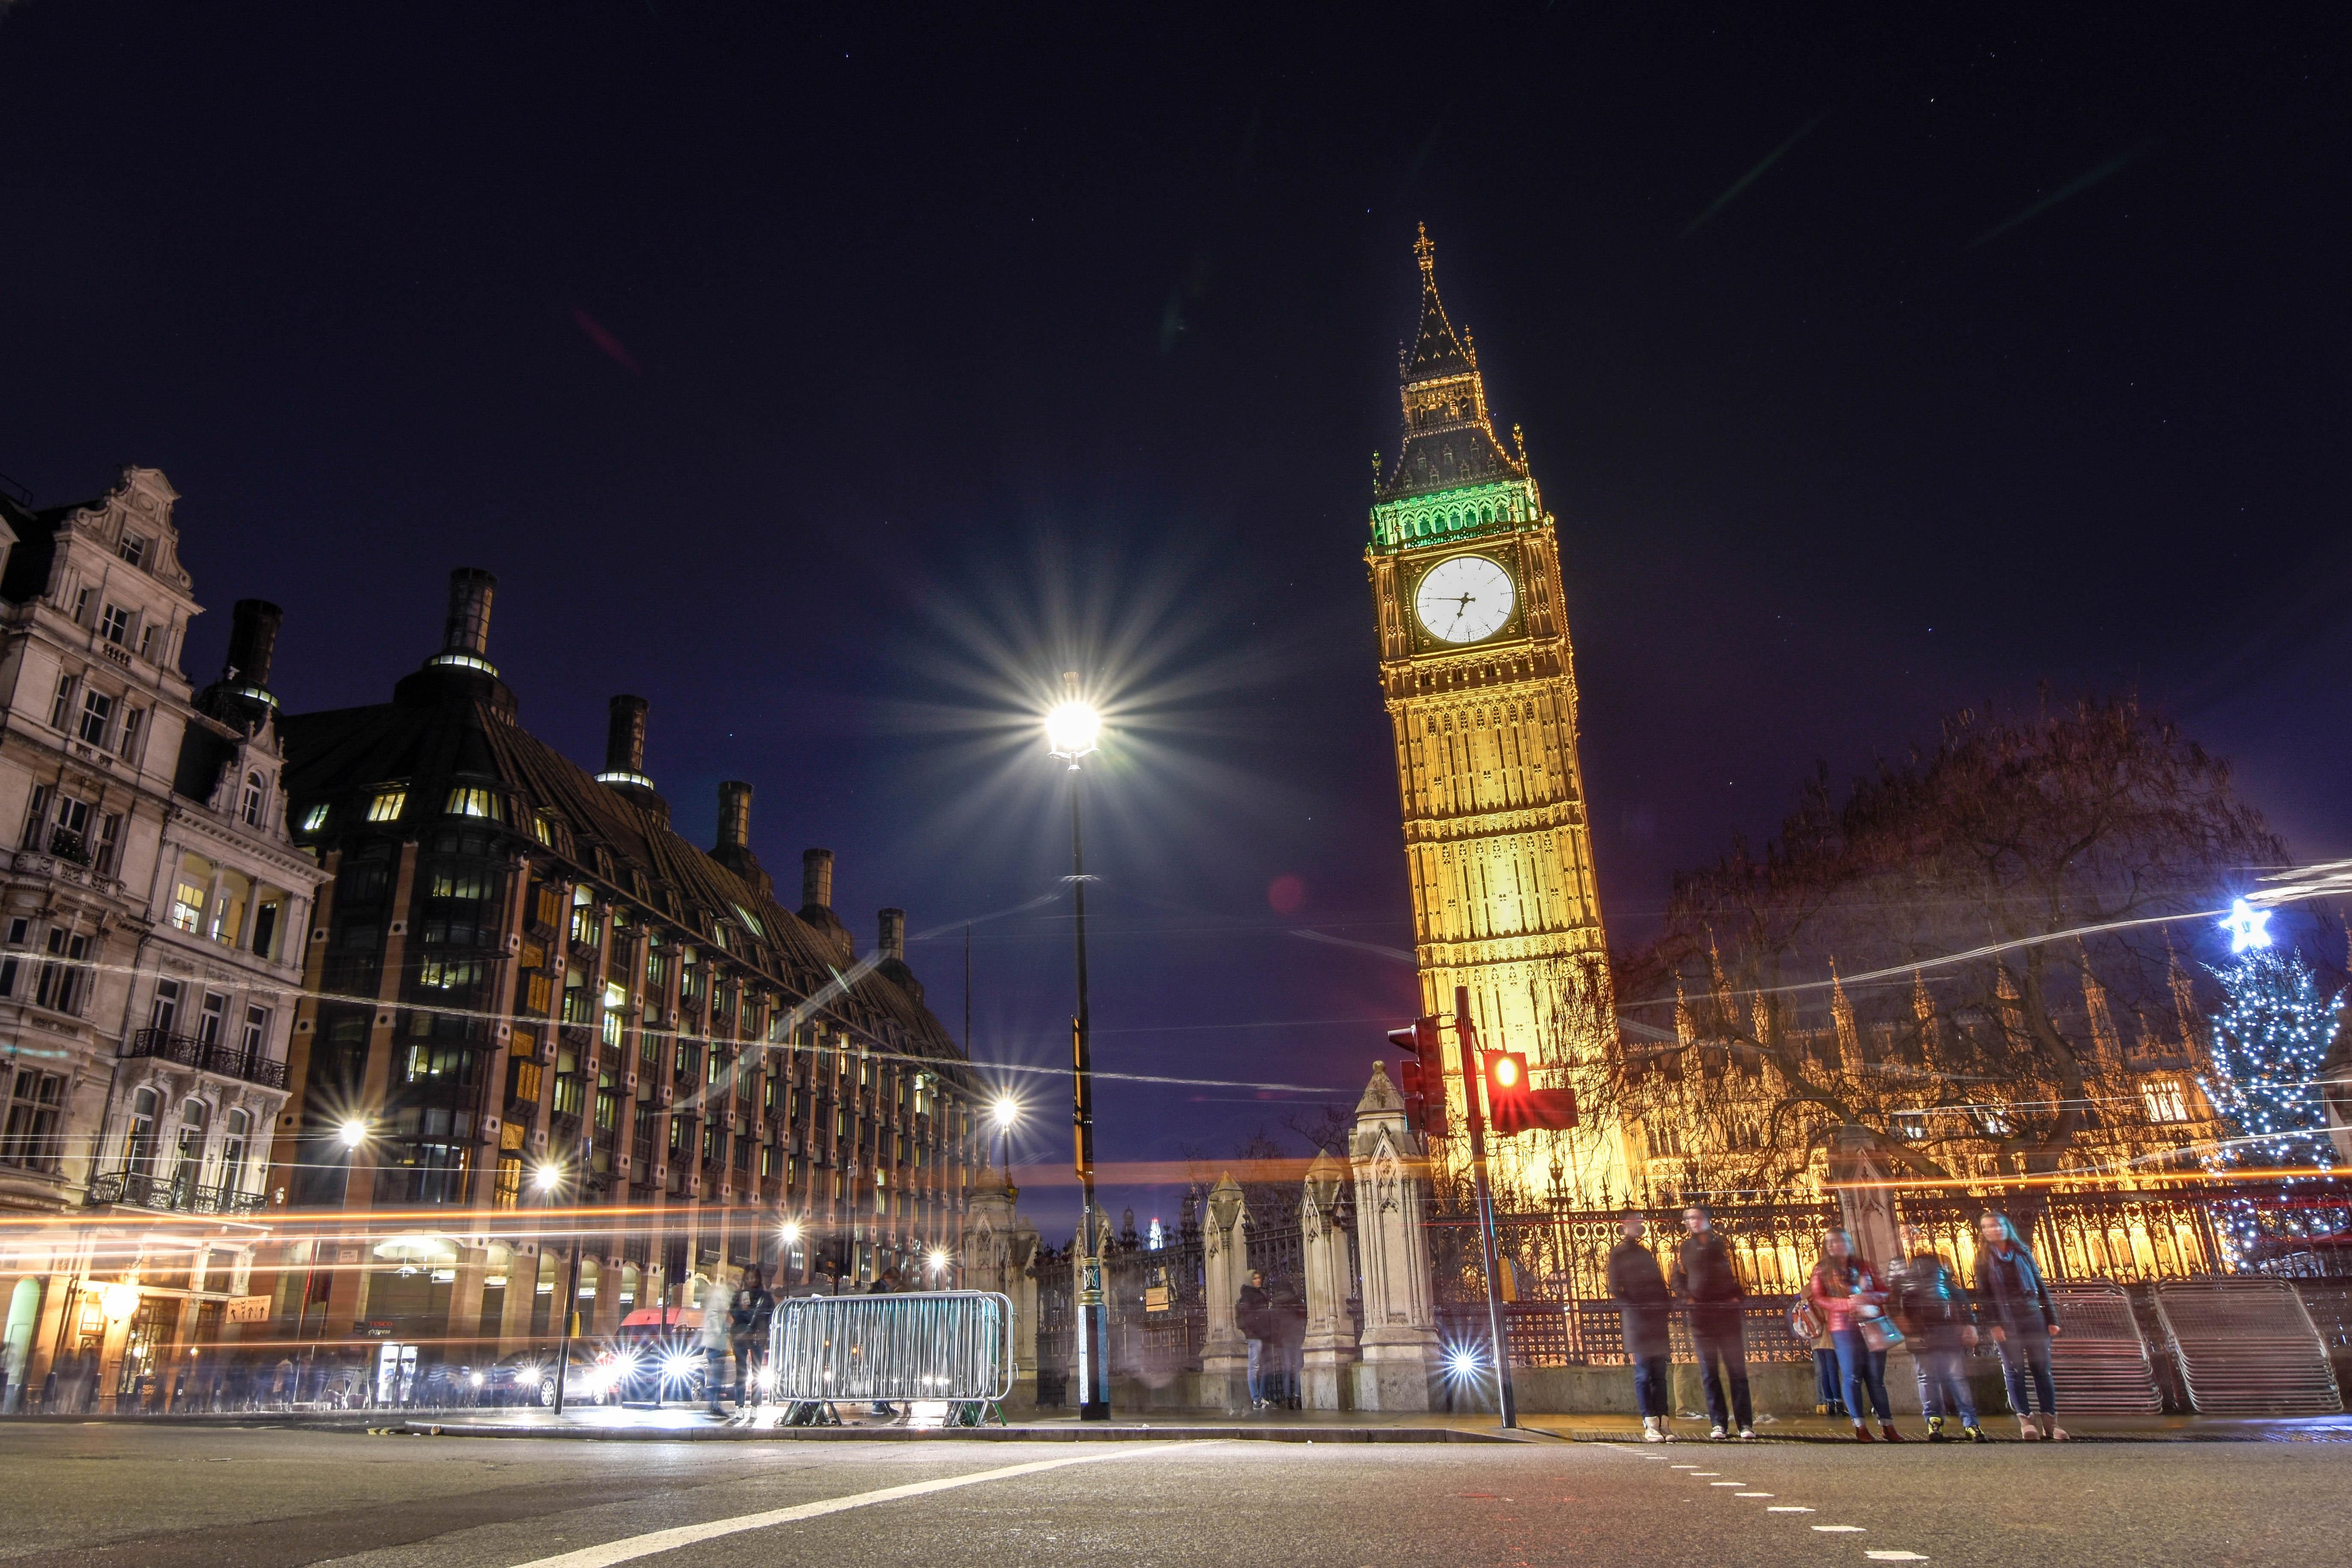 Tower of London, Tower Bridge, Shakespeare's Globe, Thames River Cruise, ohne London Pass, Hop on Hop off Bus Tour, Churchill War Rooms, London Bridge Experience, HMS Belfast, Westminster Abbey, Kensington Palace, London Zoo,